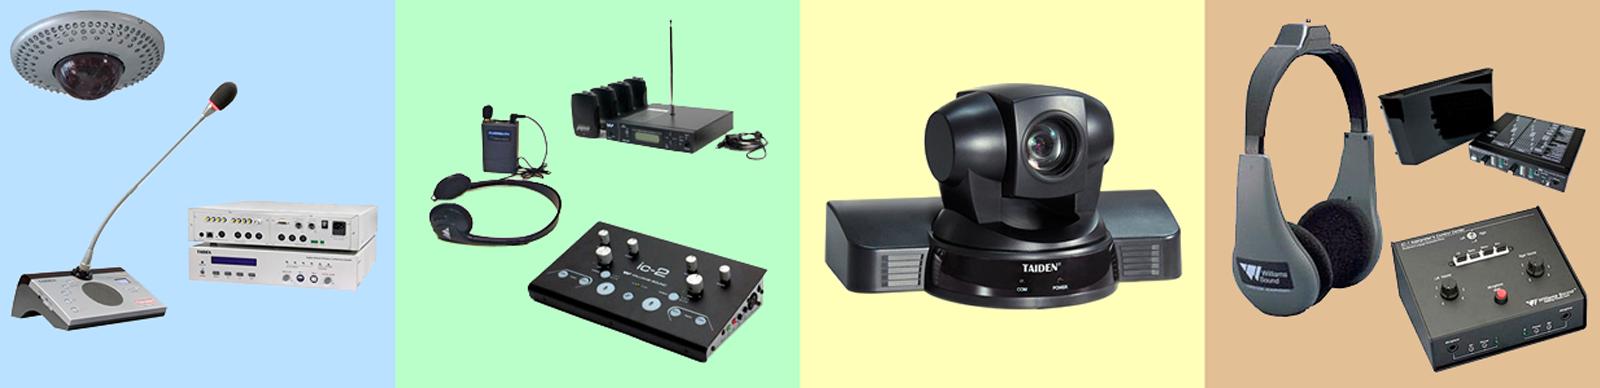 Equipment portable equipo interpreters Pastels